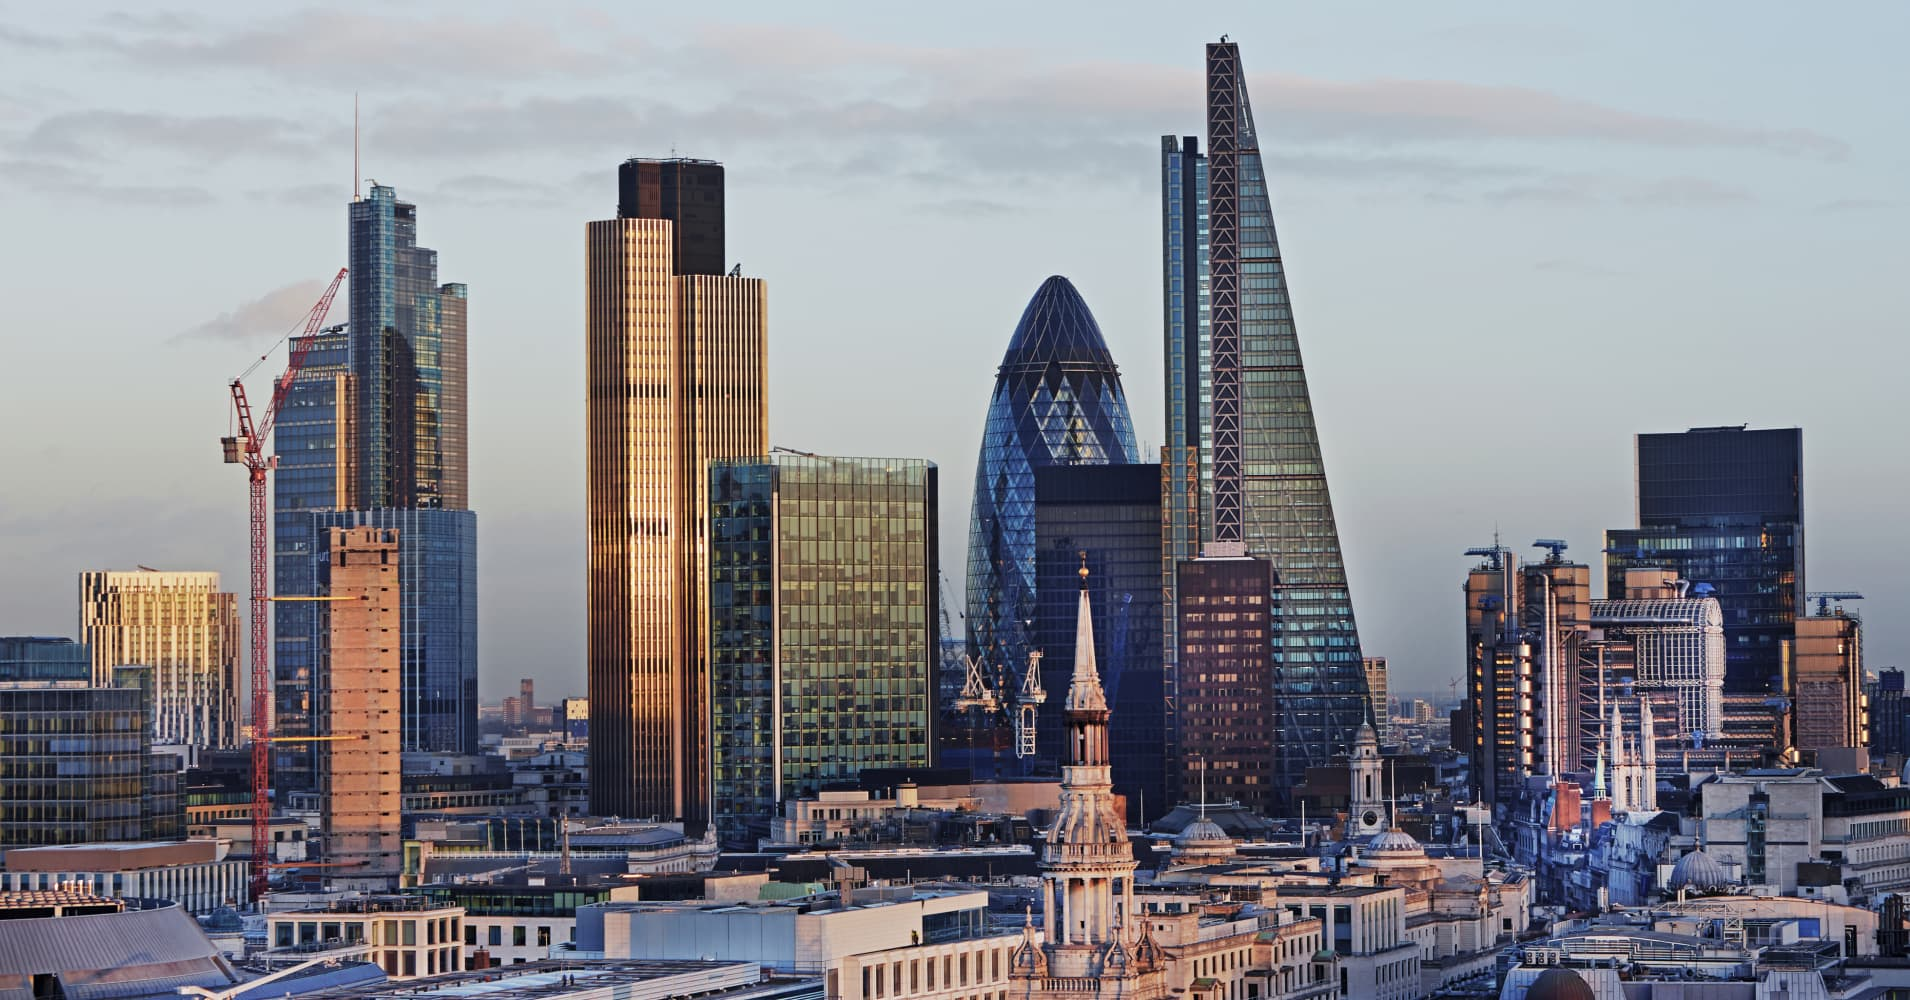 The Londoner